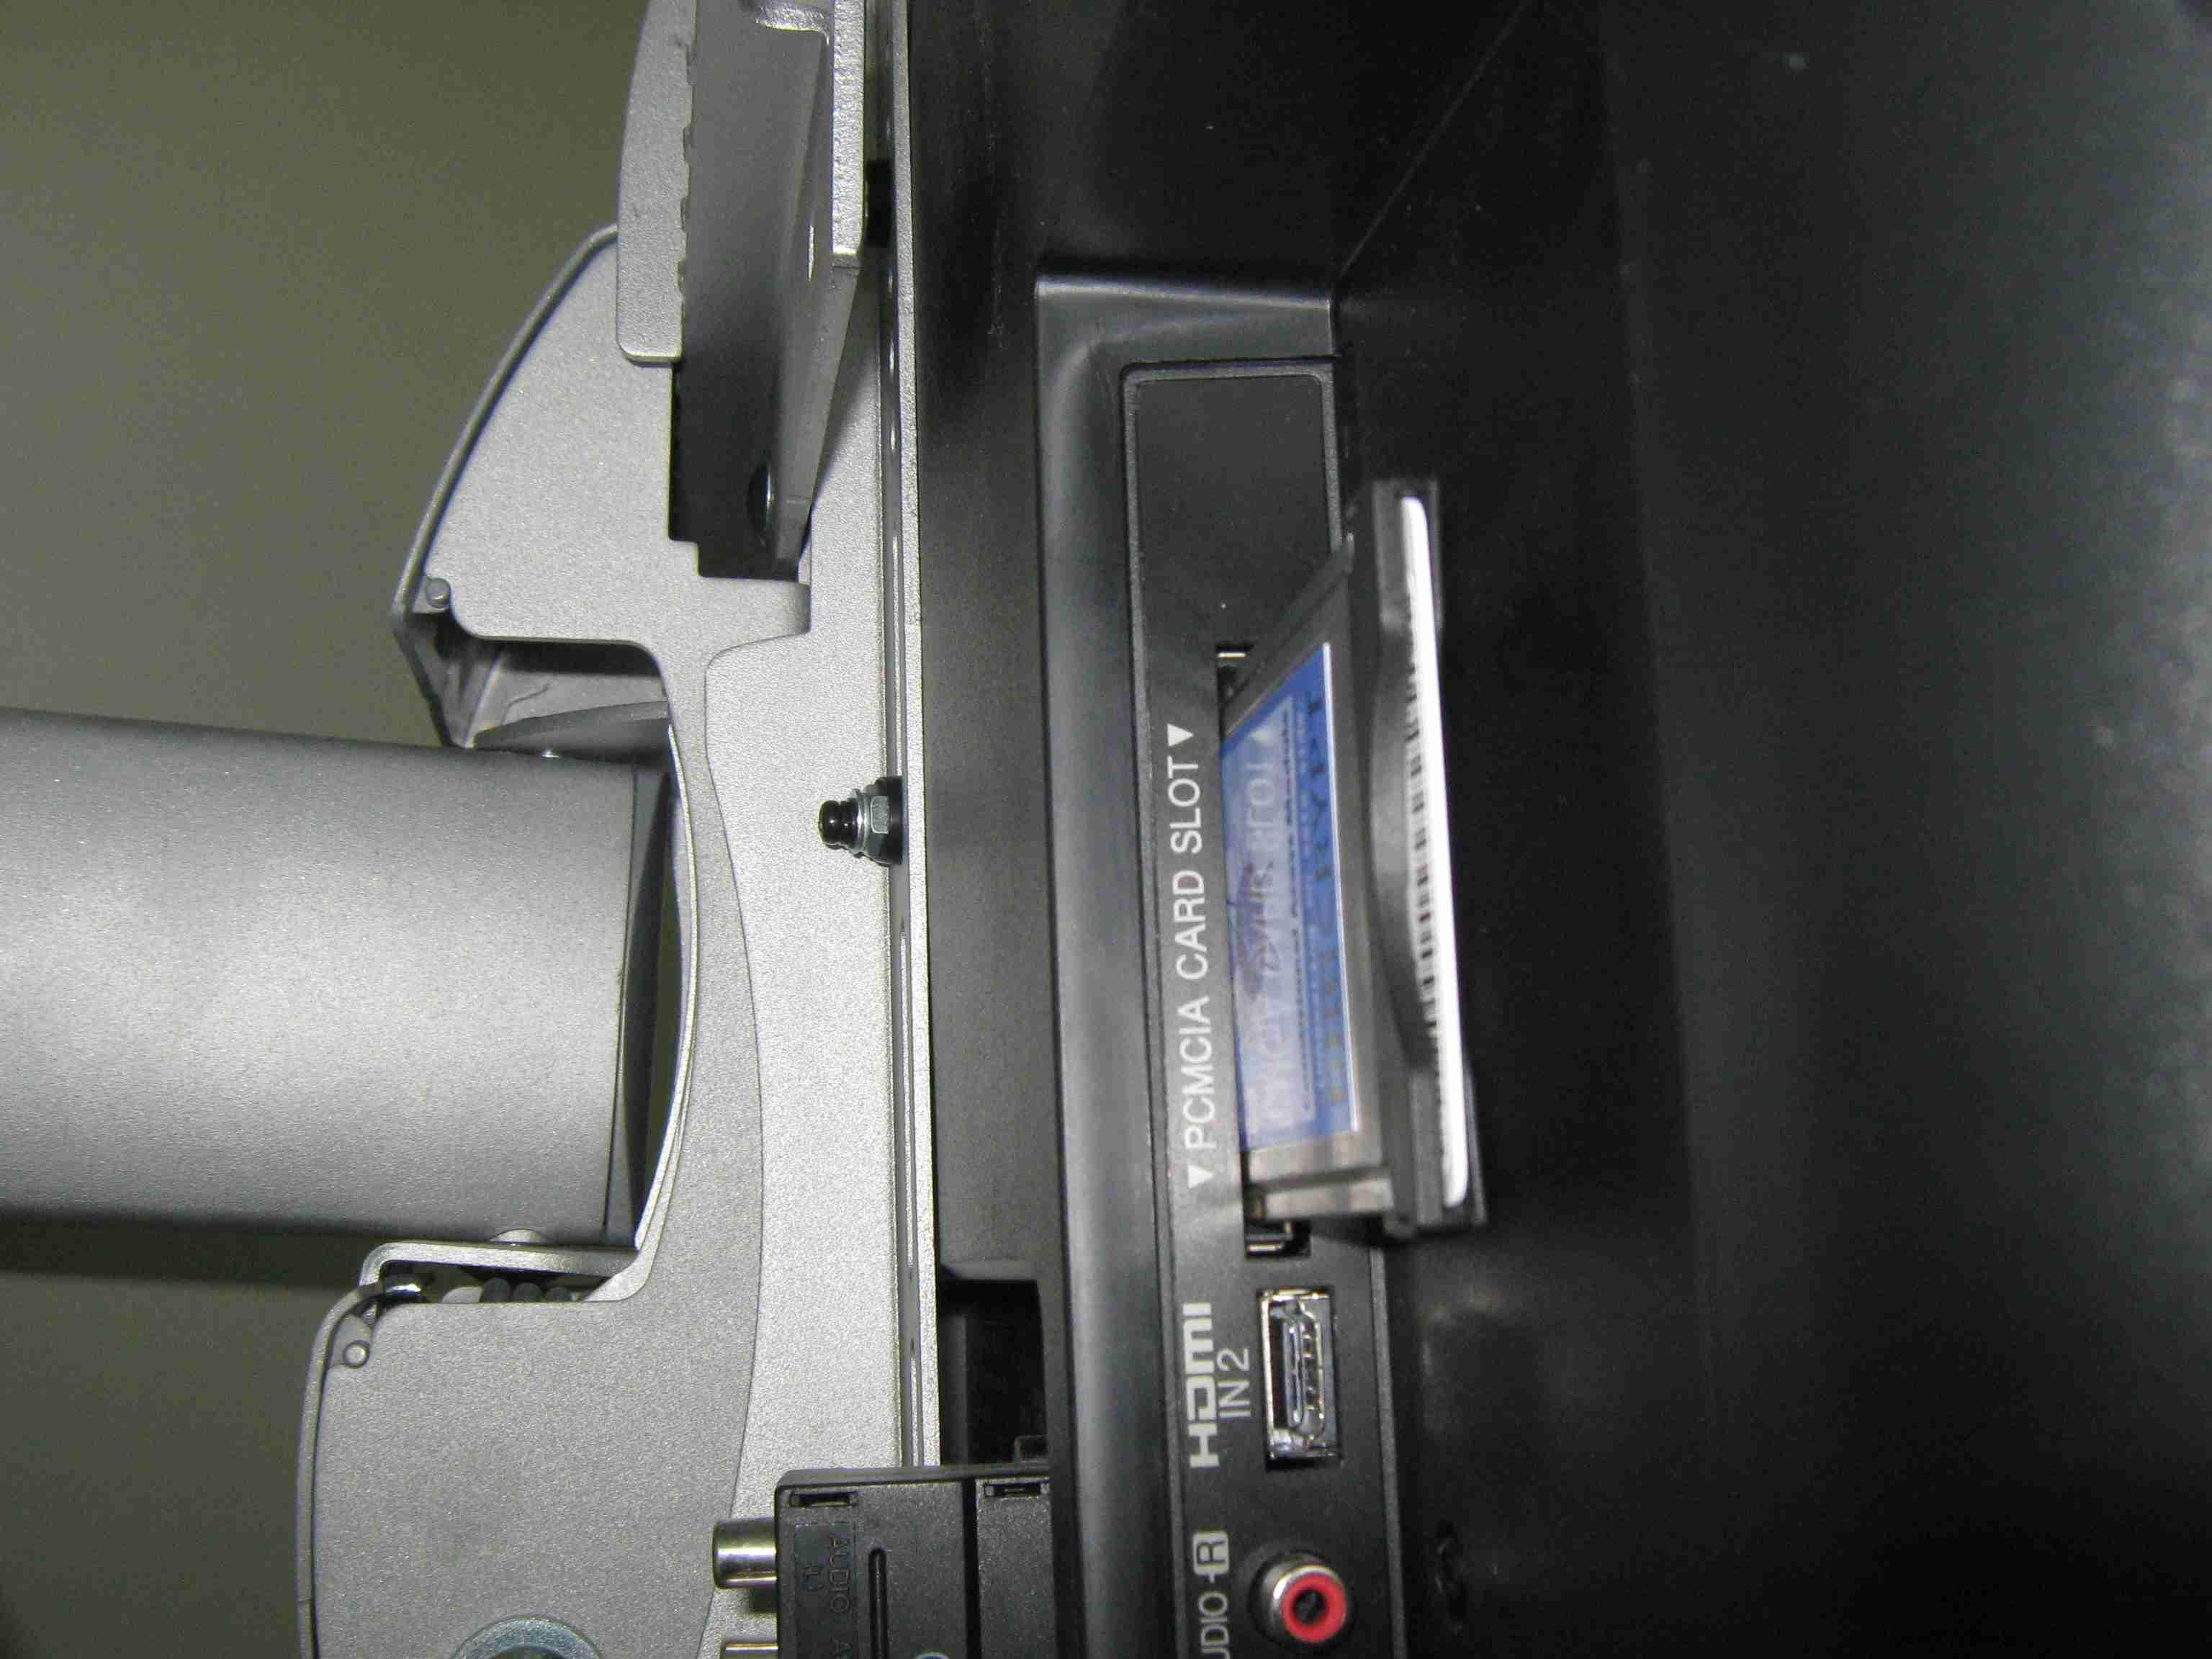 инструкция по настройке телевизора с картой доступа ci